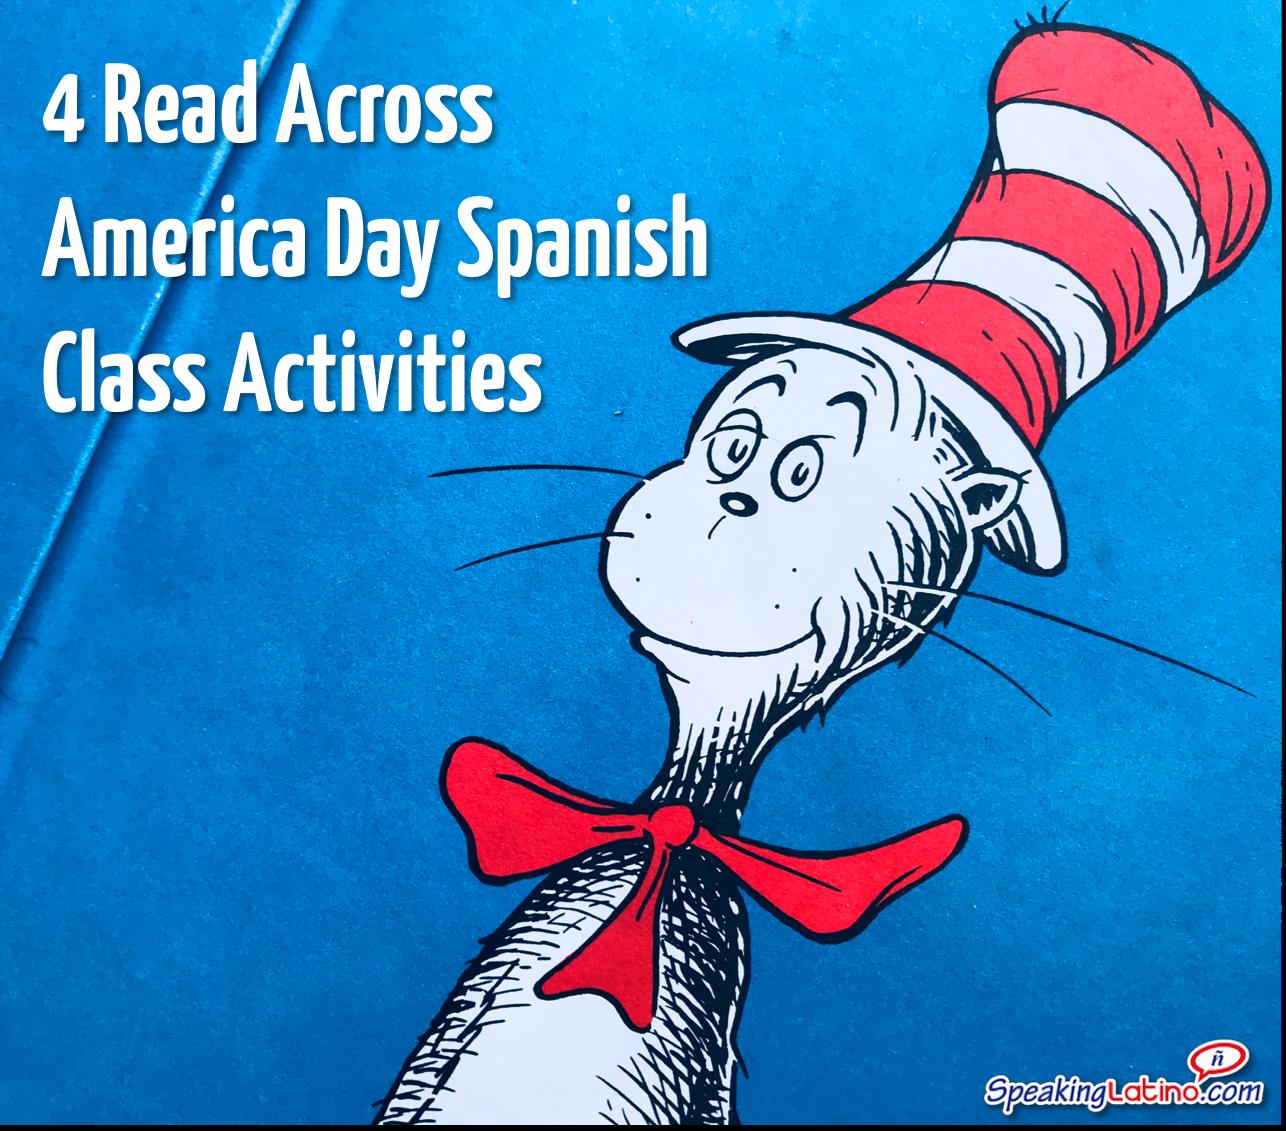 Dr Seuss Day 4 Read Across America Day Spanish Class